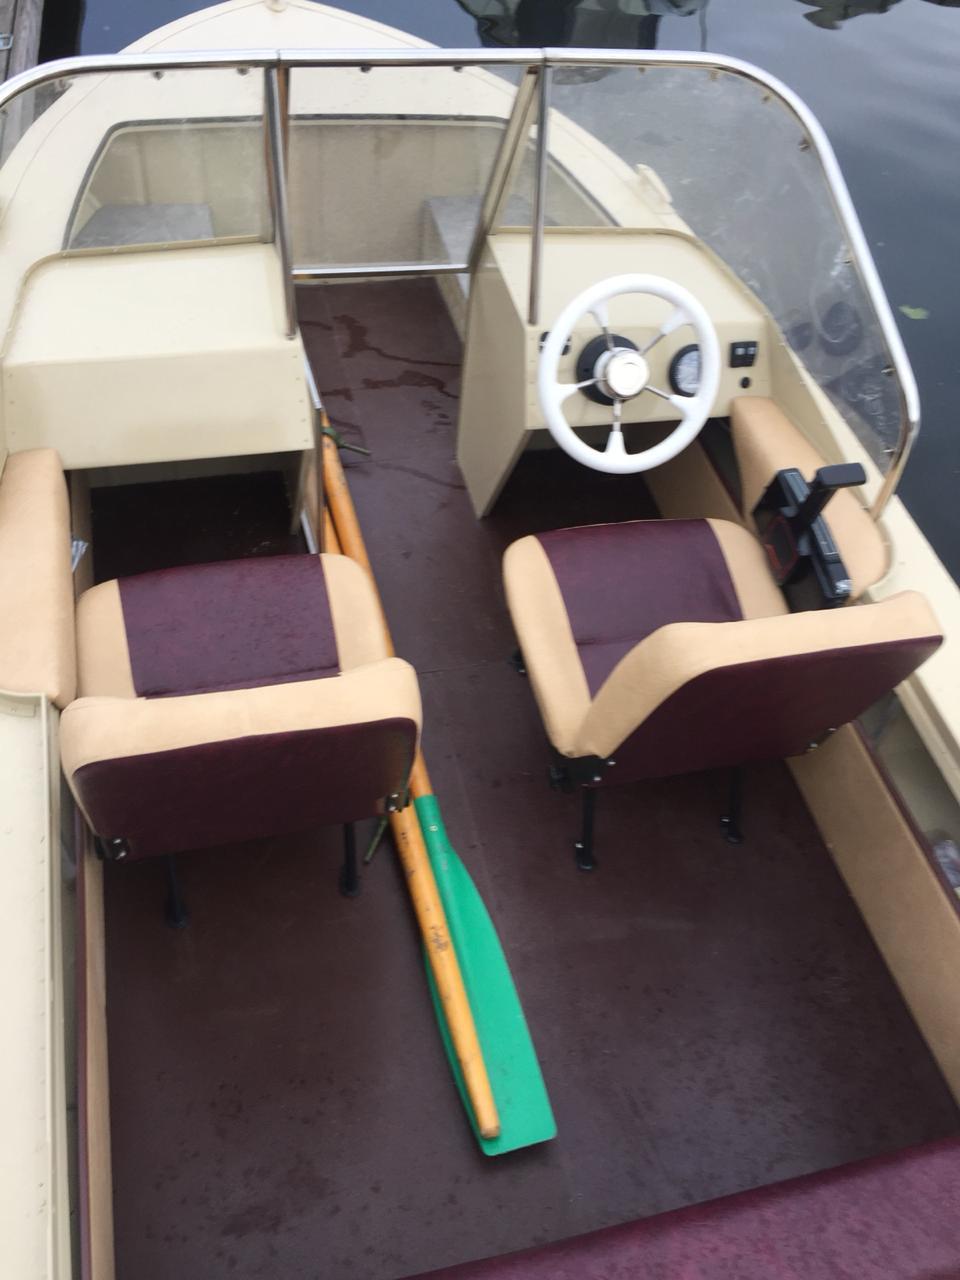 Тюнинг катера «Прогресс 2м» цена в компании «МаринЛайн». Ссылка на фотографию: http://marinline.ru/uploads/posts/2018-08/1533720870_photo-2018-08-07-15-42-47.jpg